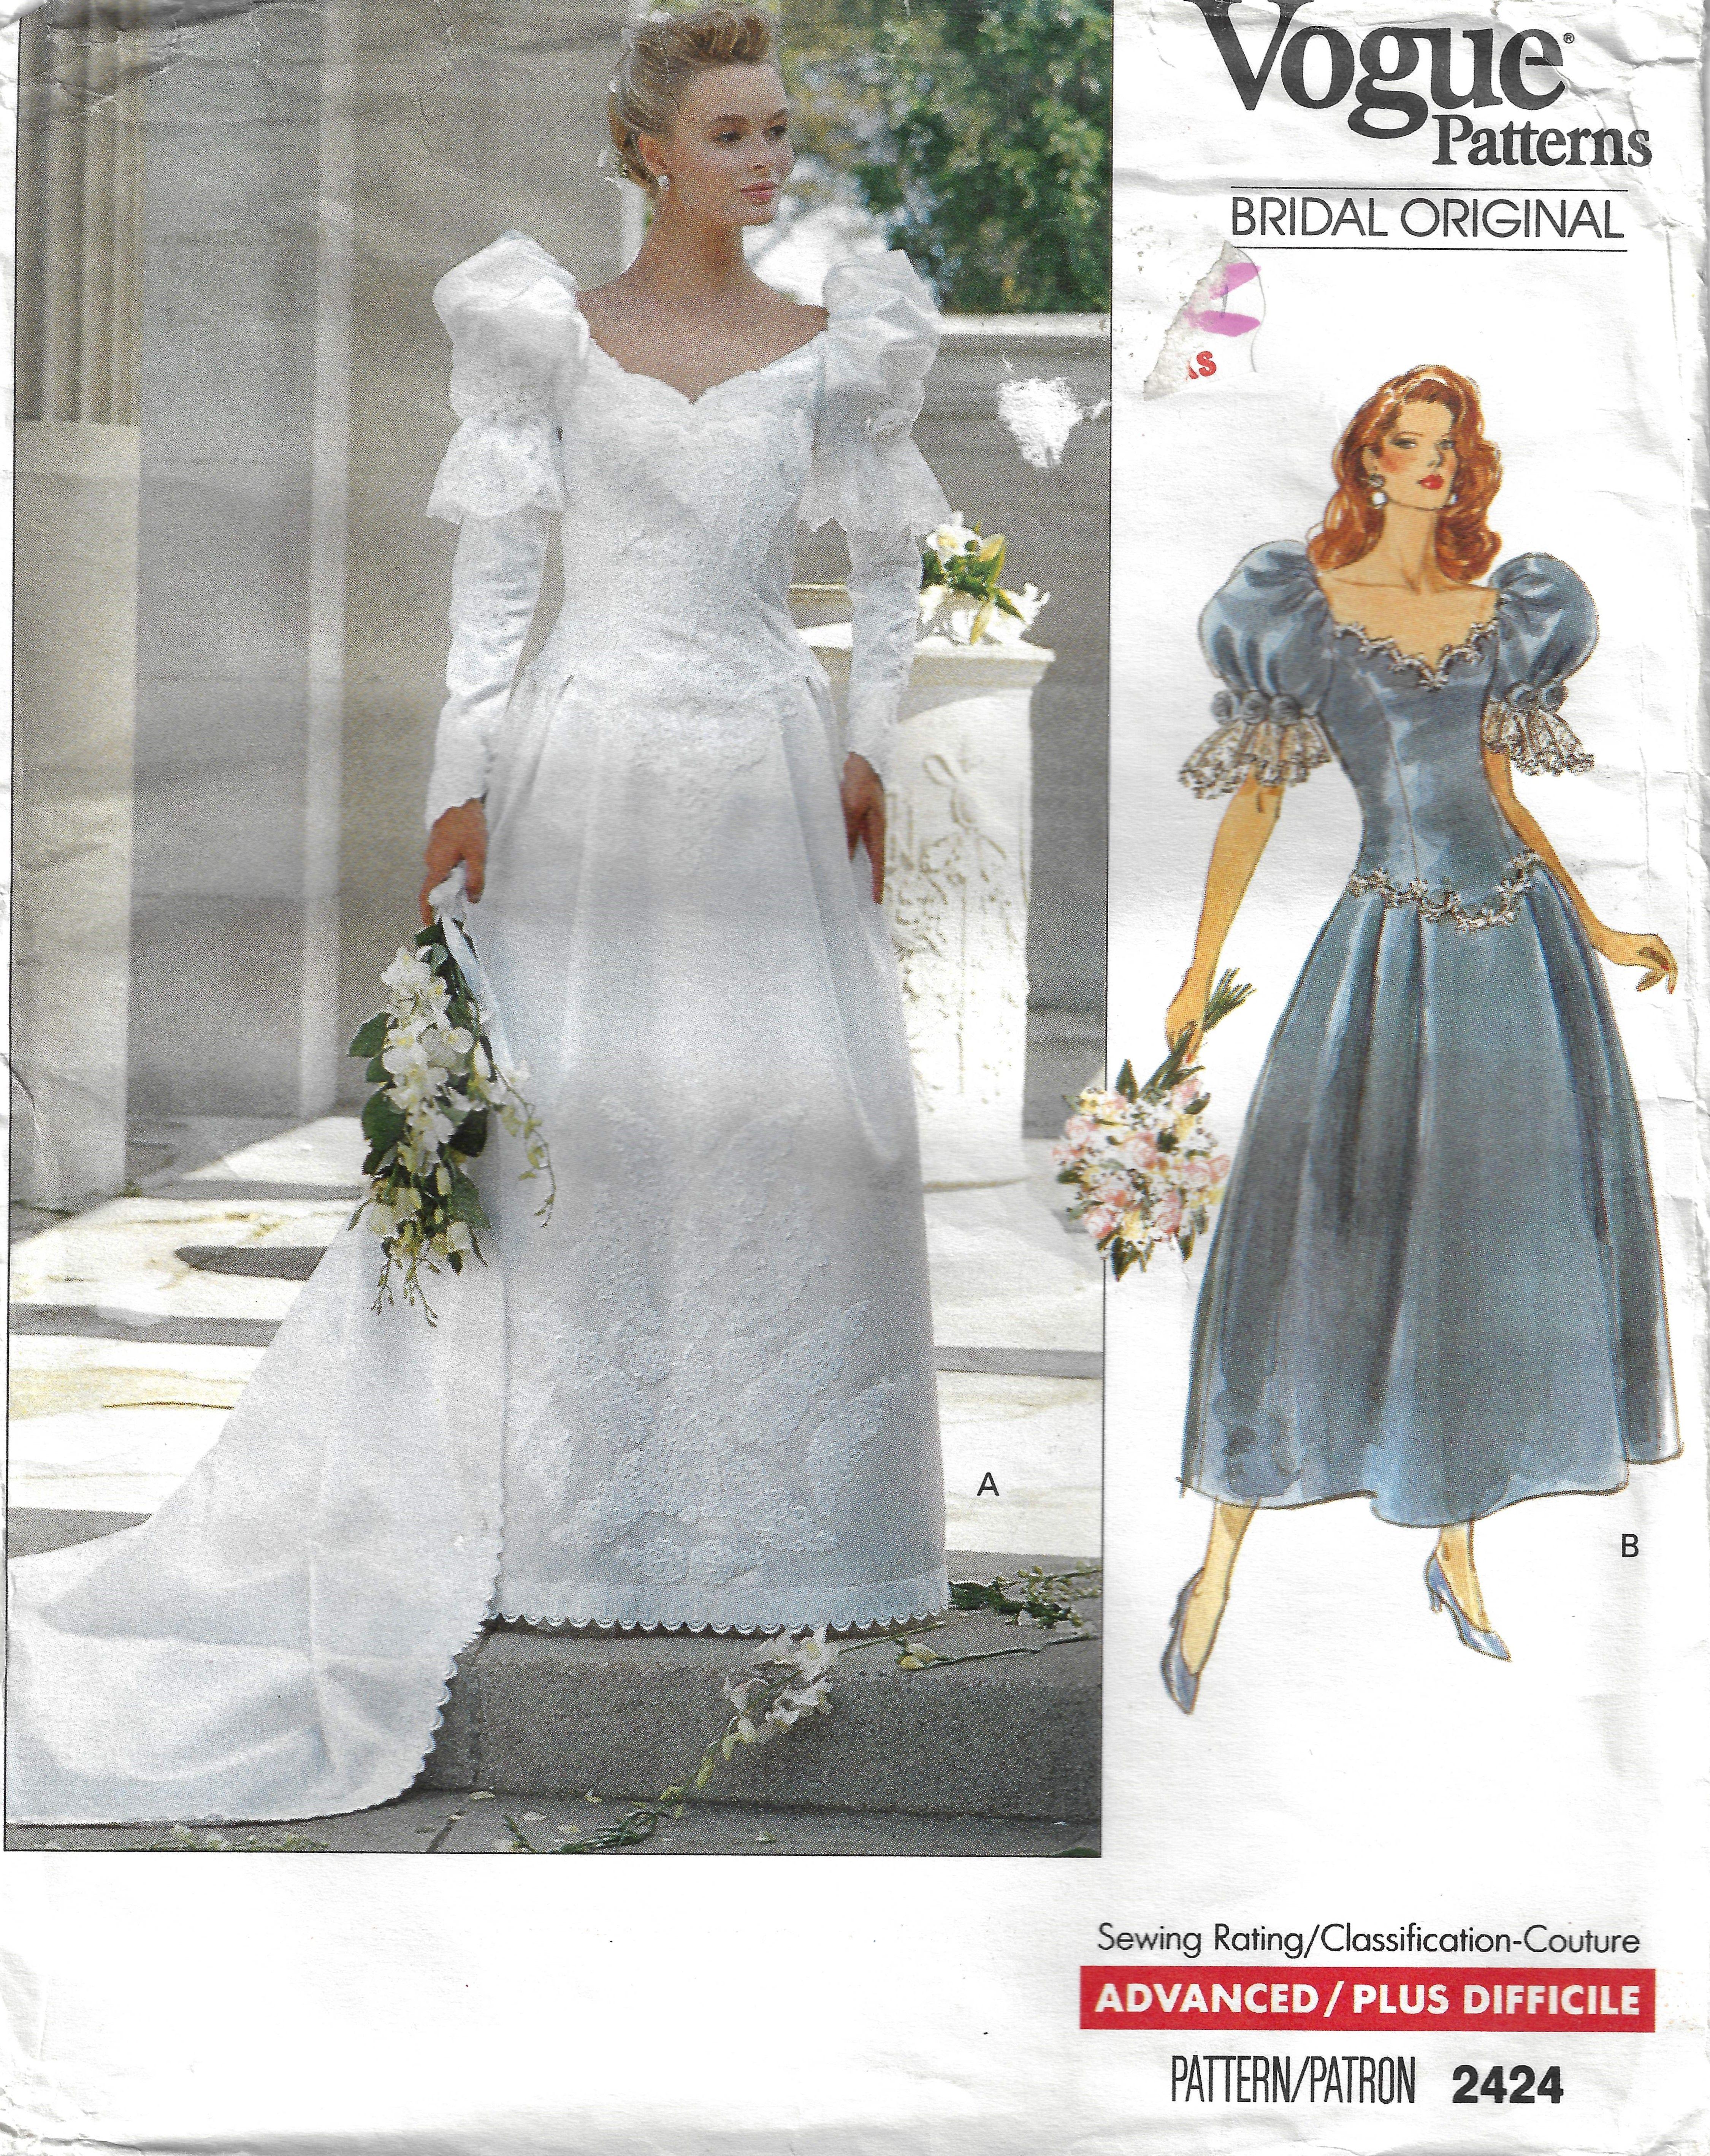 Vogue Bridal Original 2424 Wedding Dress Bridesmaid Ca 1990s: Bridal Originals 1990s Wedding Dresses At Reisefeber.org